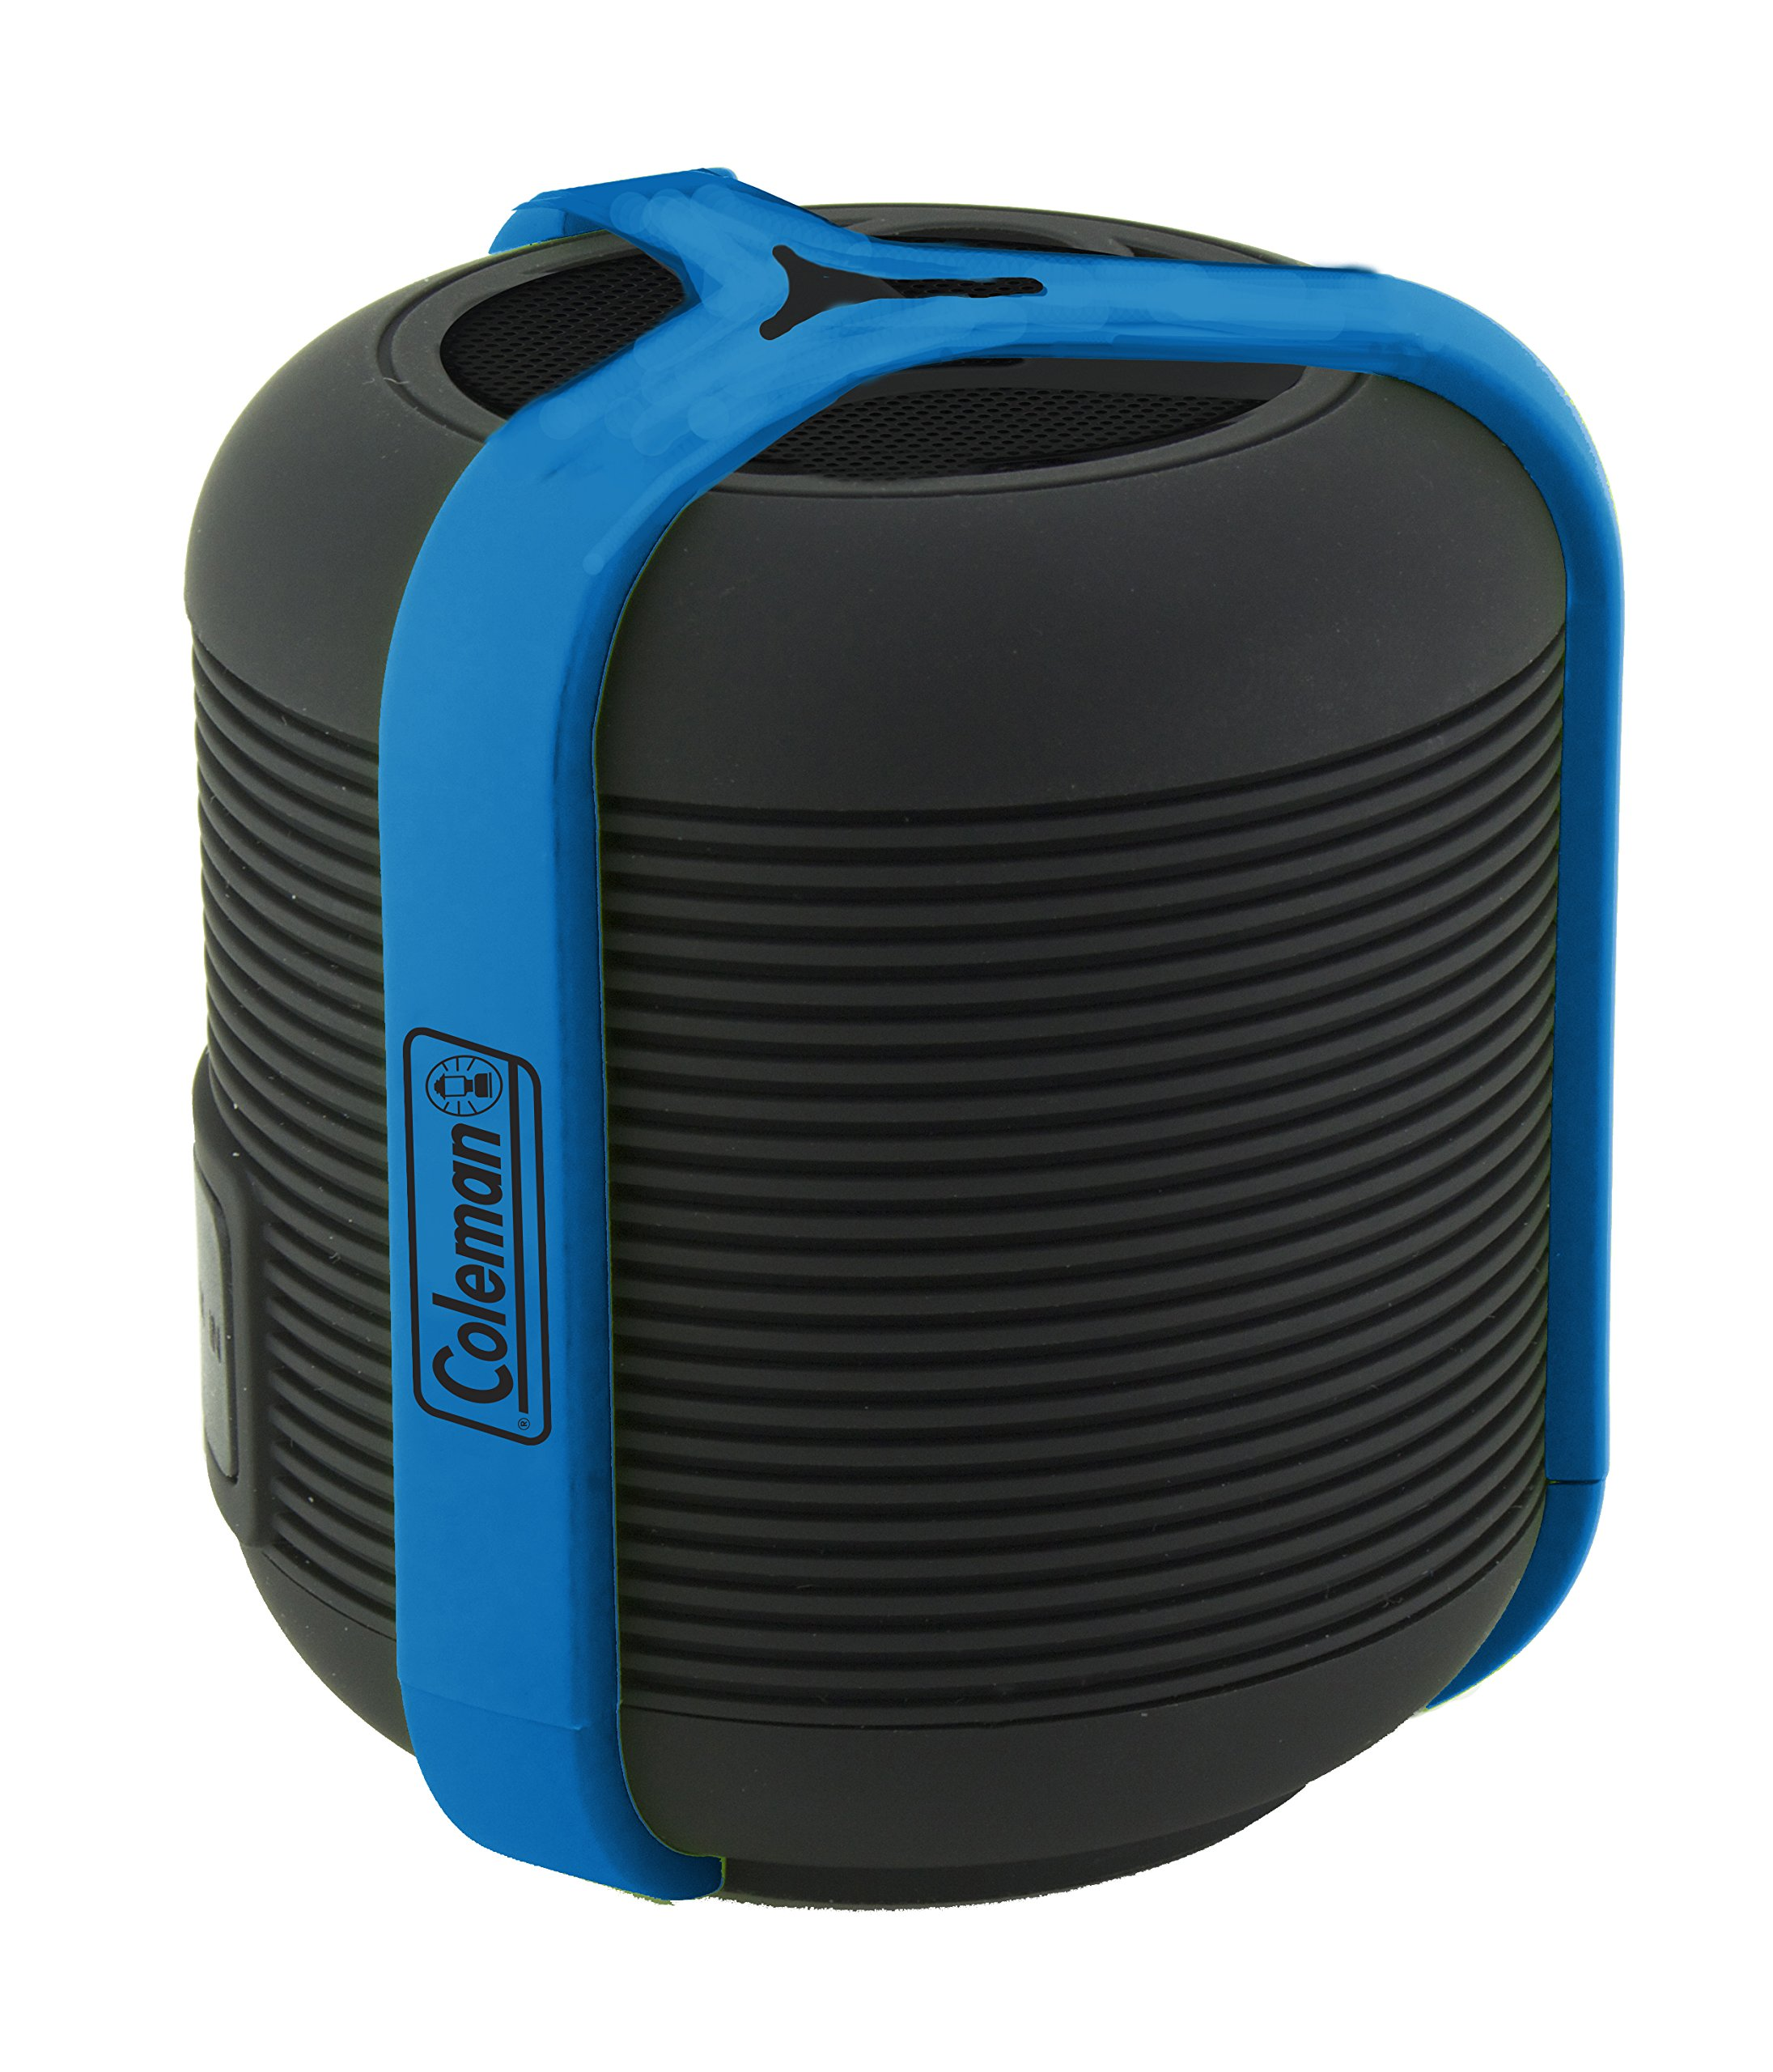 Parlante Bluetooth Coleman Aktiv Sounds Waterproof Mini (CBT